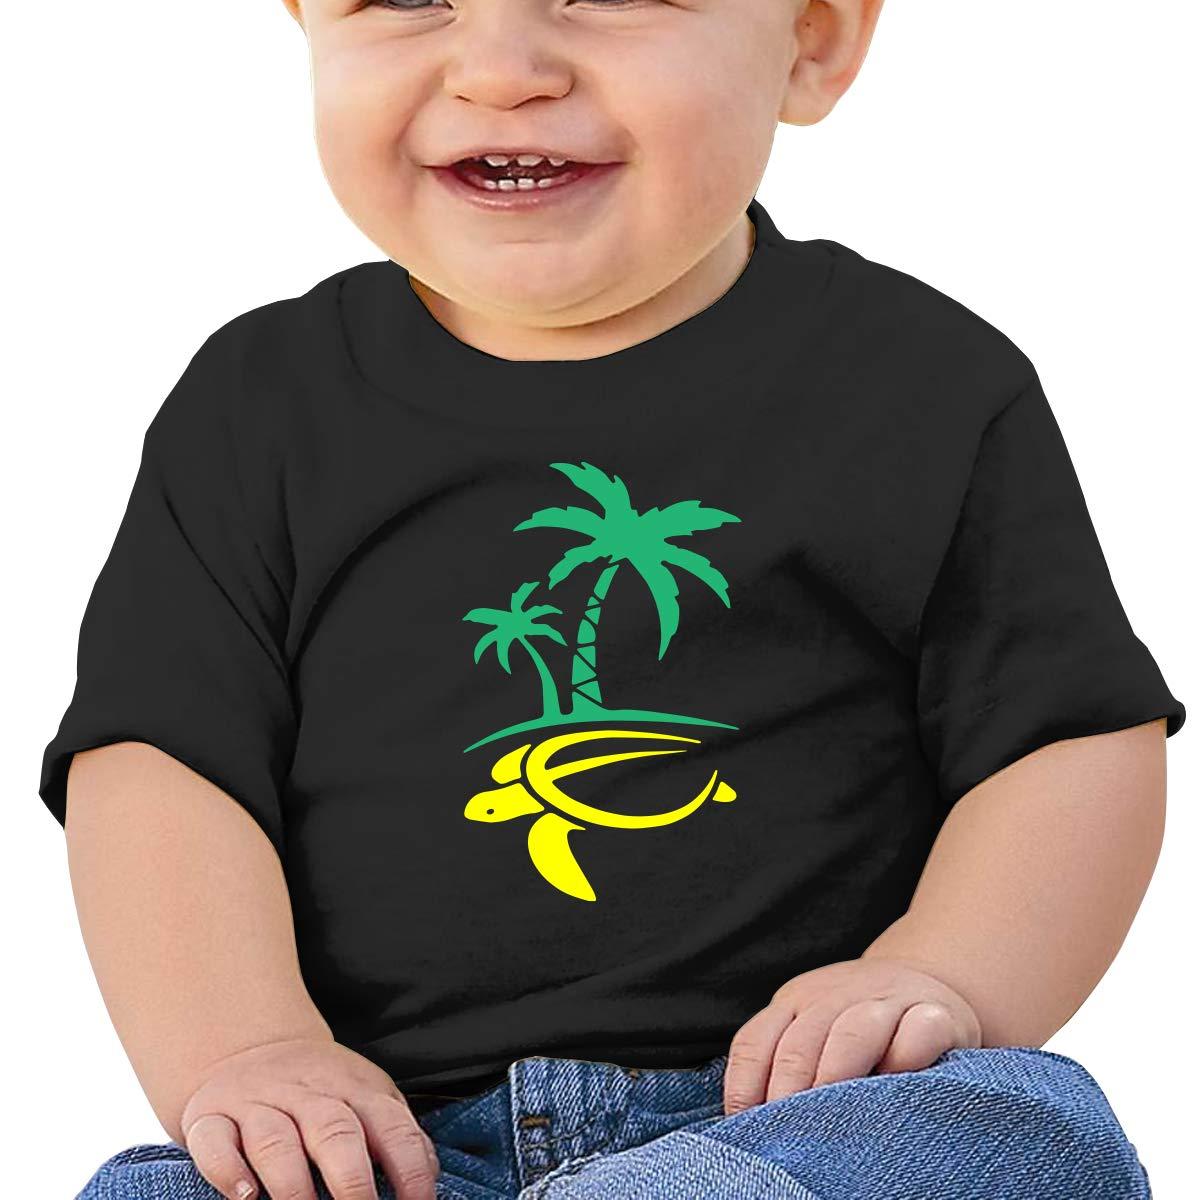 Hawaiian Palm Tree and Sea Turtle Baby Girl Newborn Short Sleeve T Shirts 6-24 Month Cotton Tops